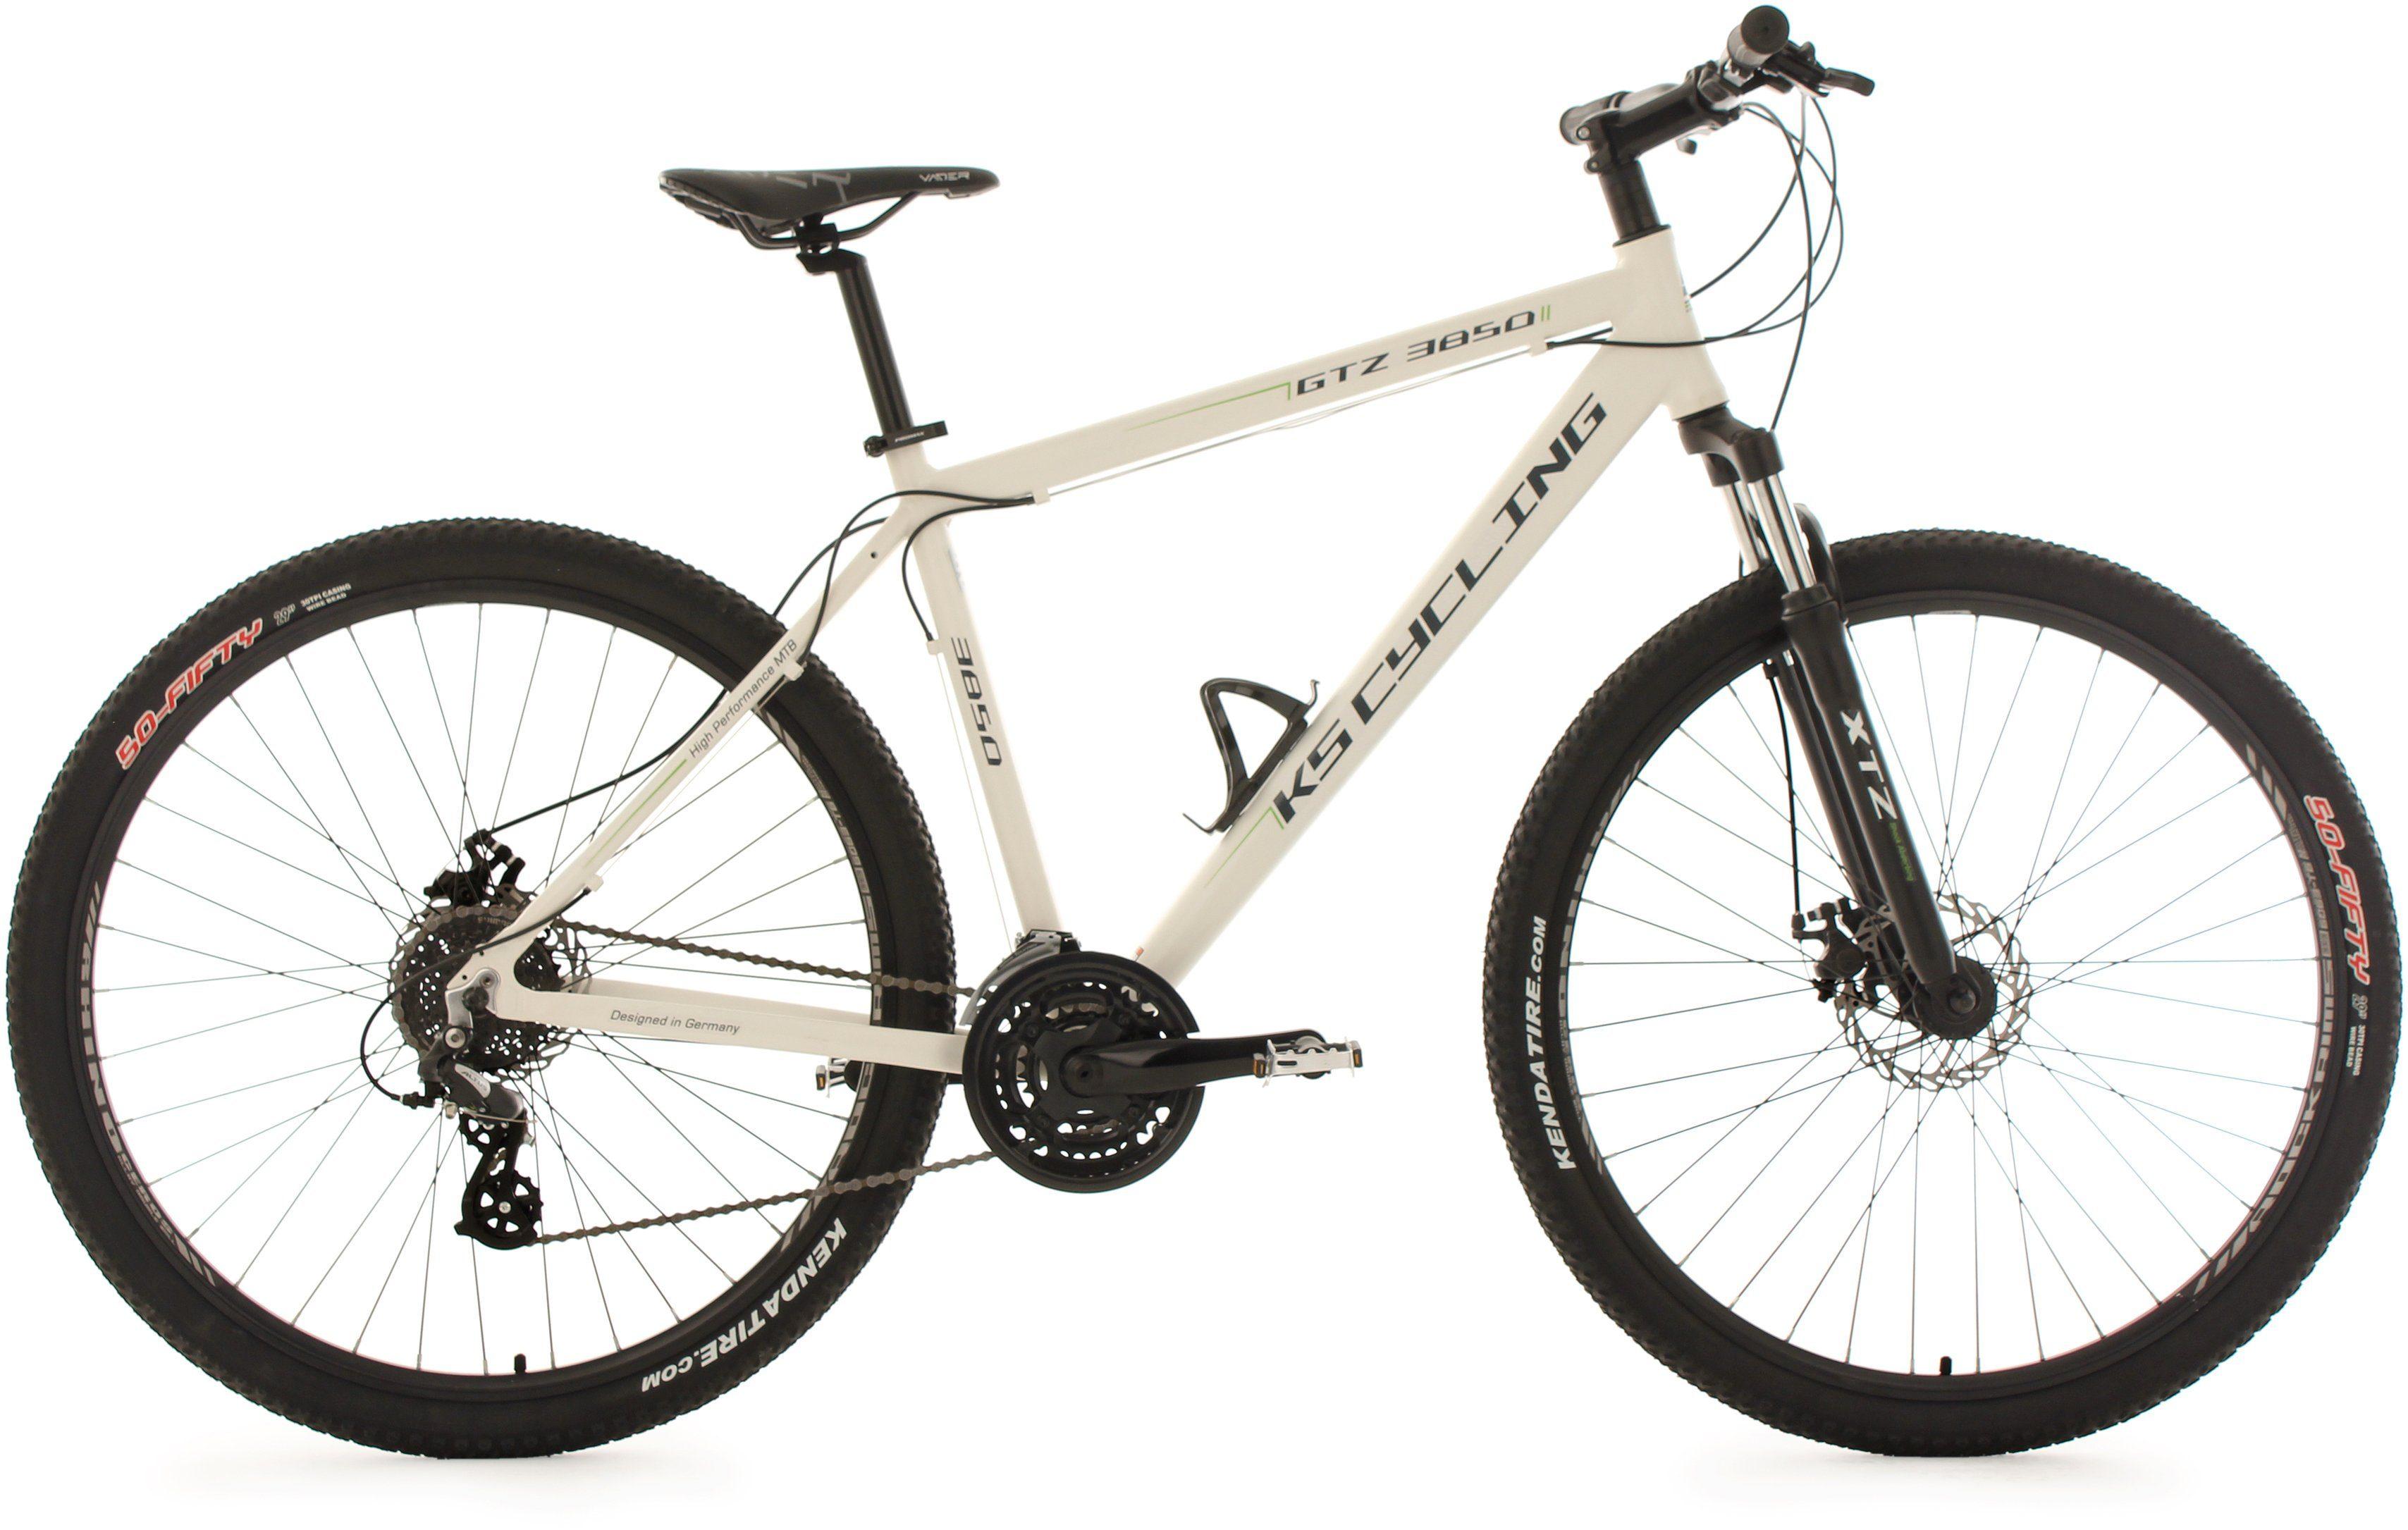 KS Cycling Hardtail-Mountainbike Herren, 29 Zoll, weiß, 24 Gang-Shimano Altus Kettenschaltung, »GTZ«